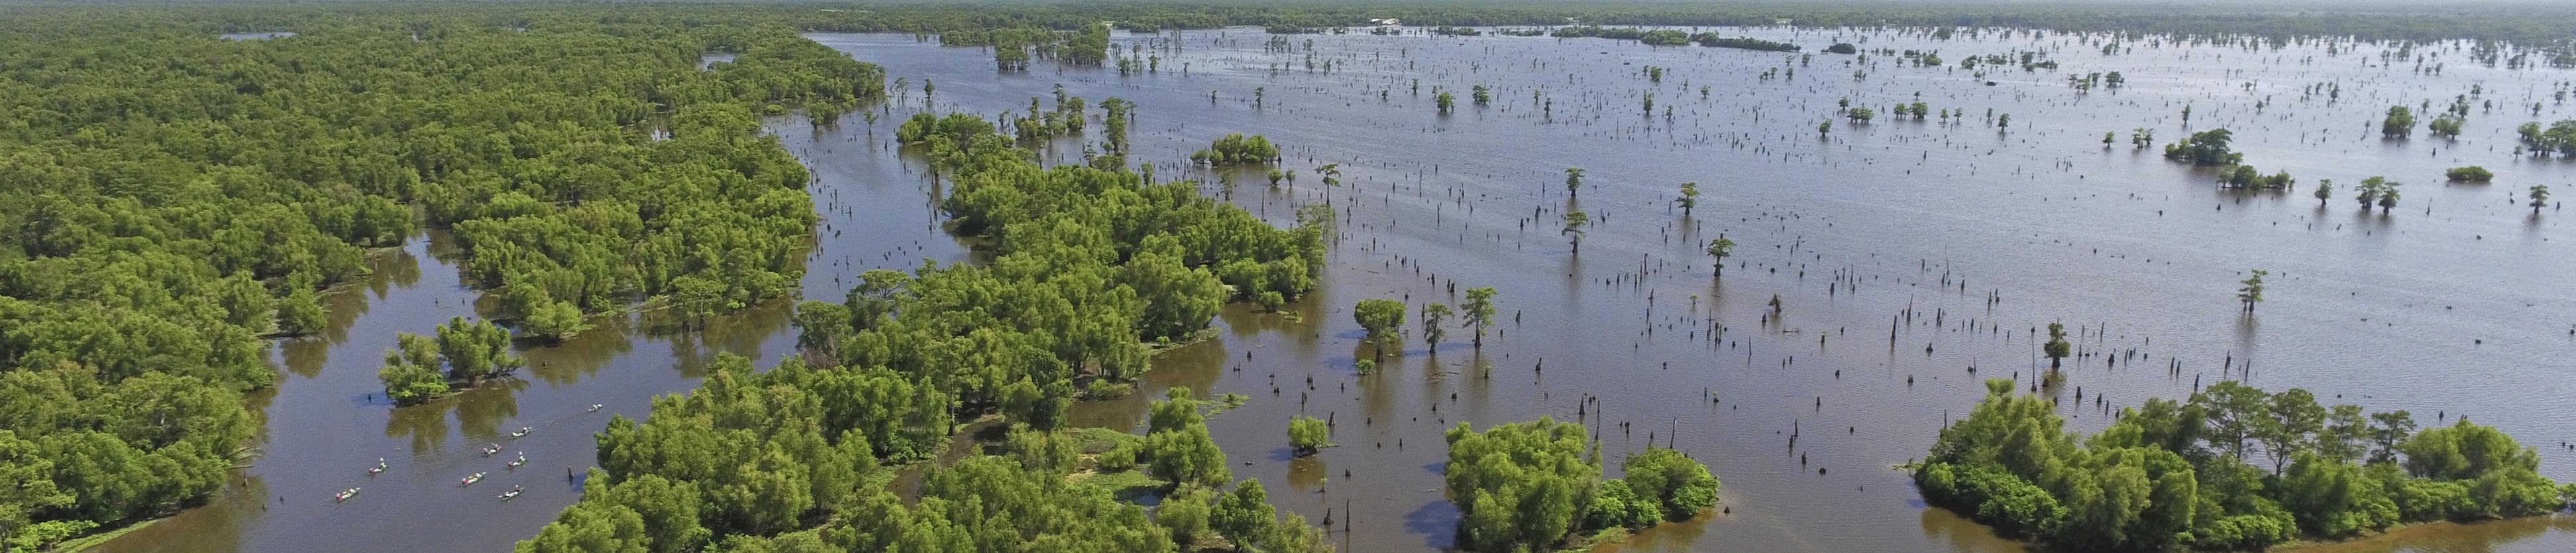 Atchafalaya Swamp aerial